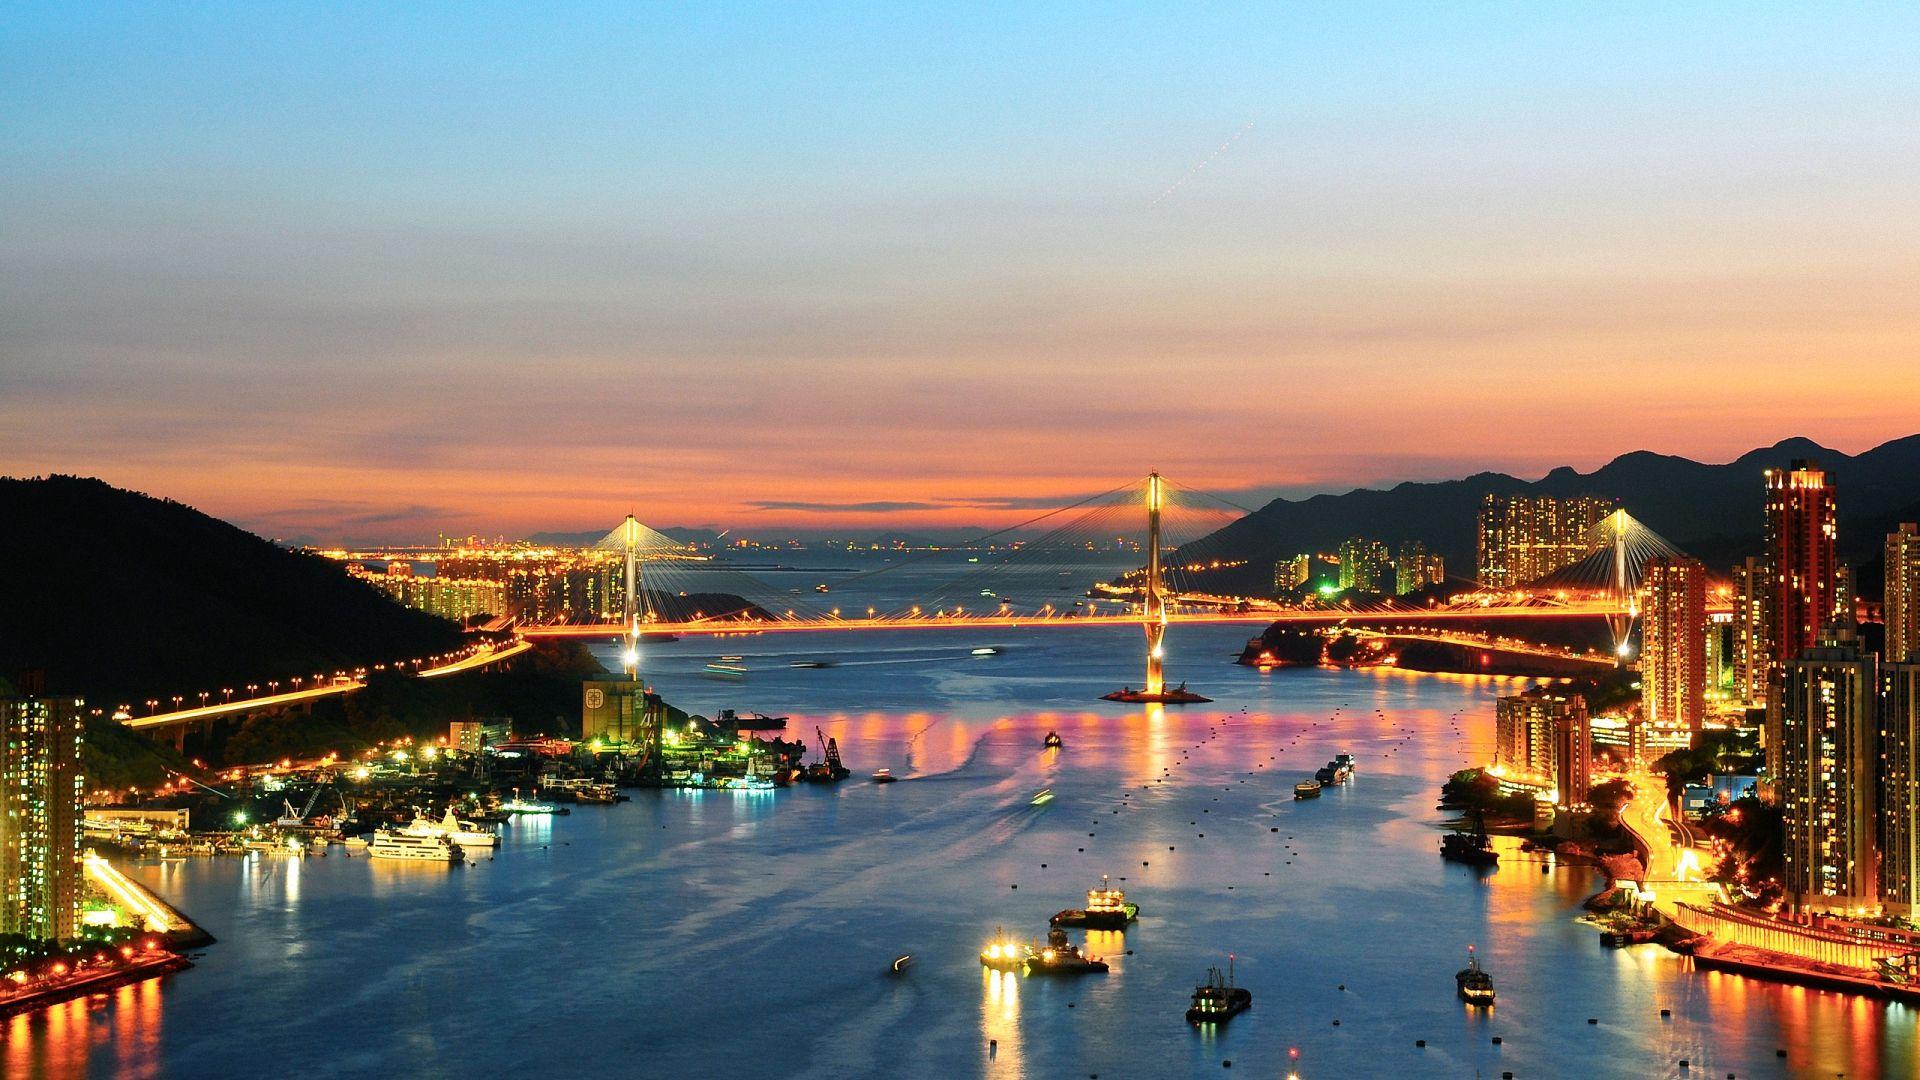 1920x1080 San Francisco City Hd Wallpapers 1080p San Francisco At Night City San Francisco City